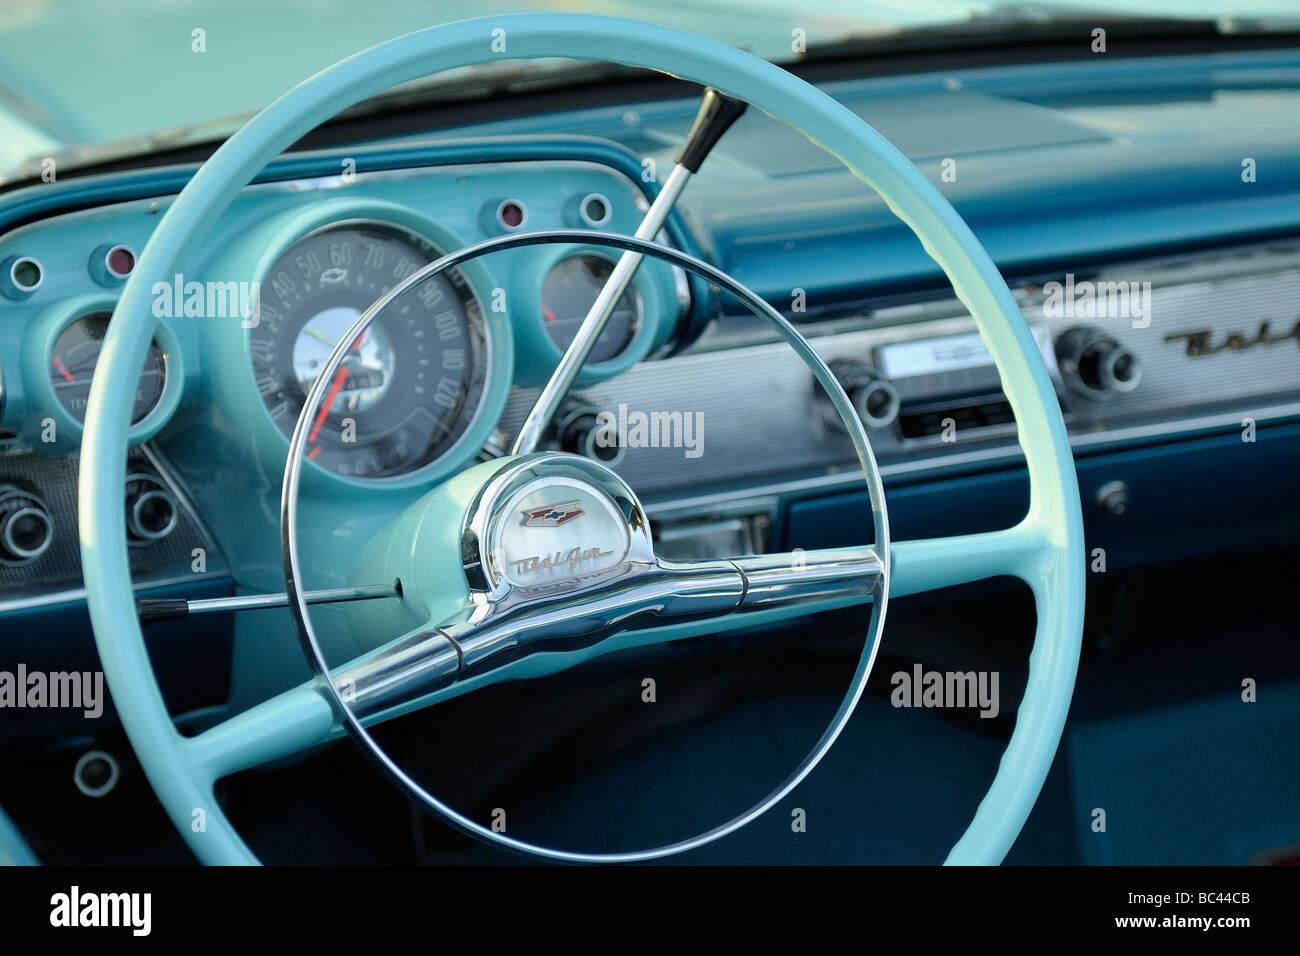 Auto d'epoca Immagini Stock